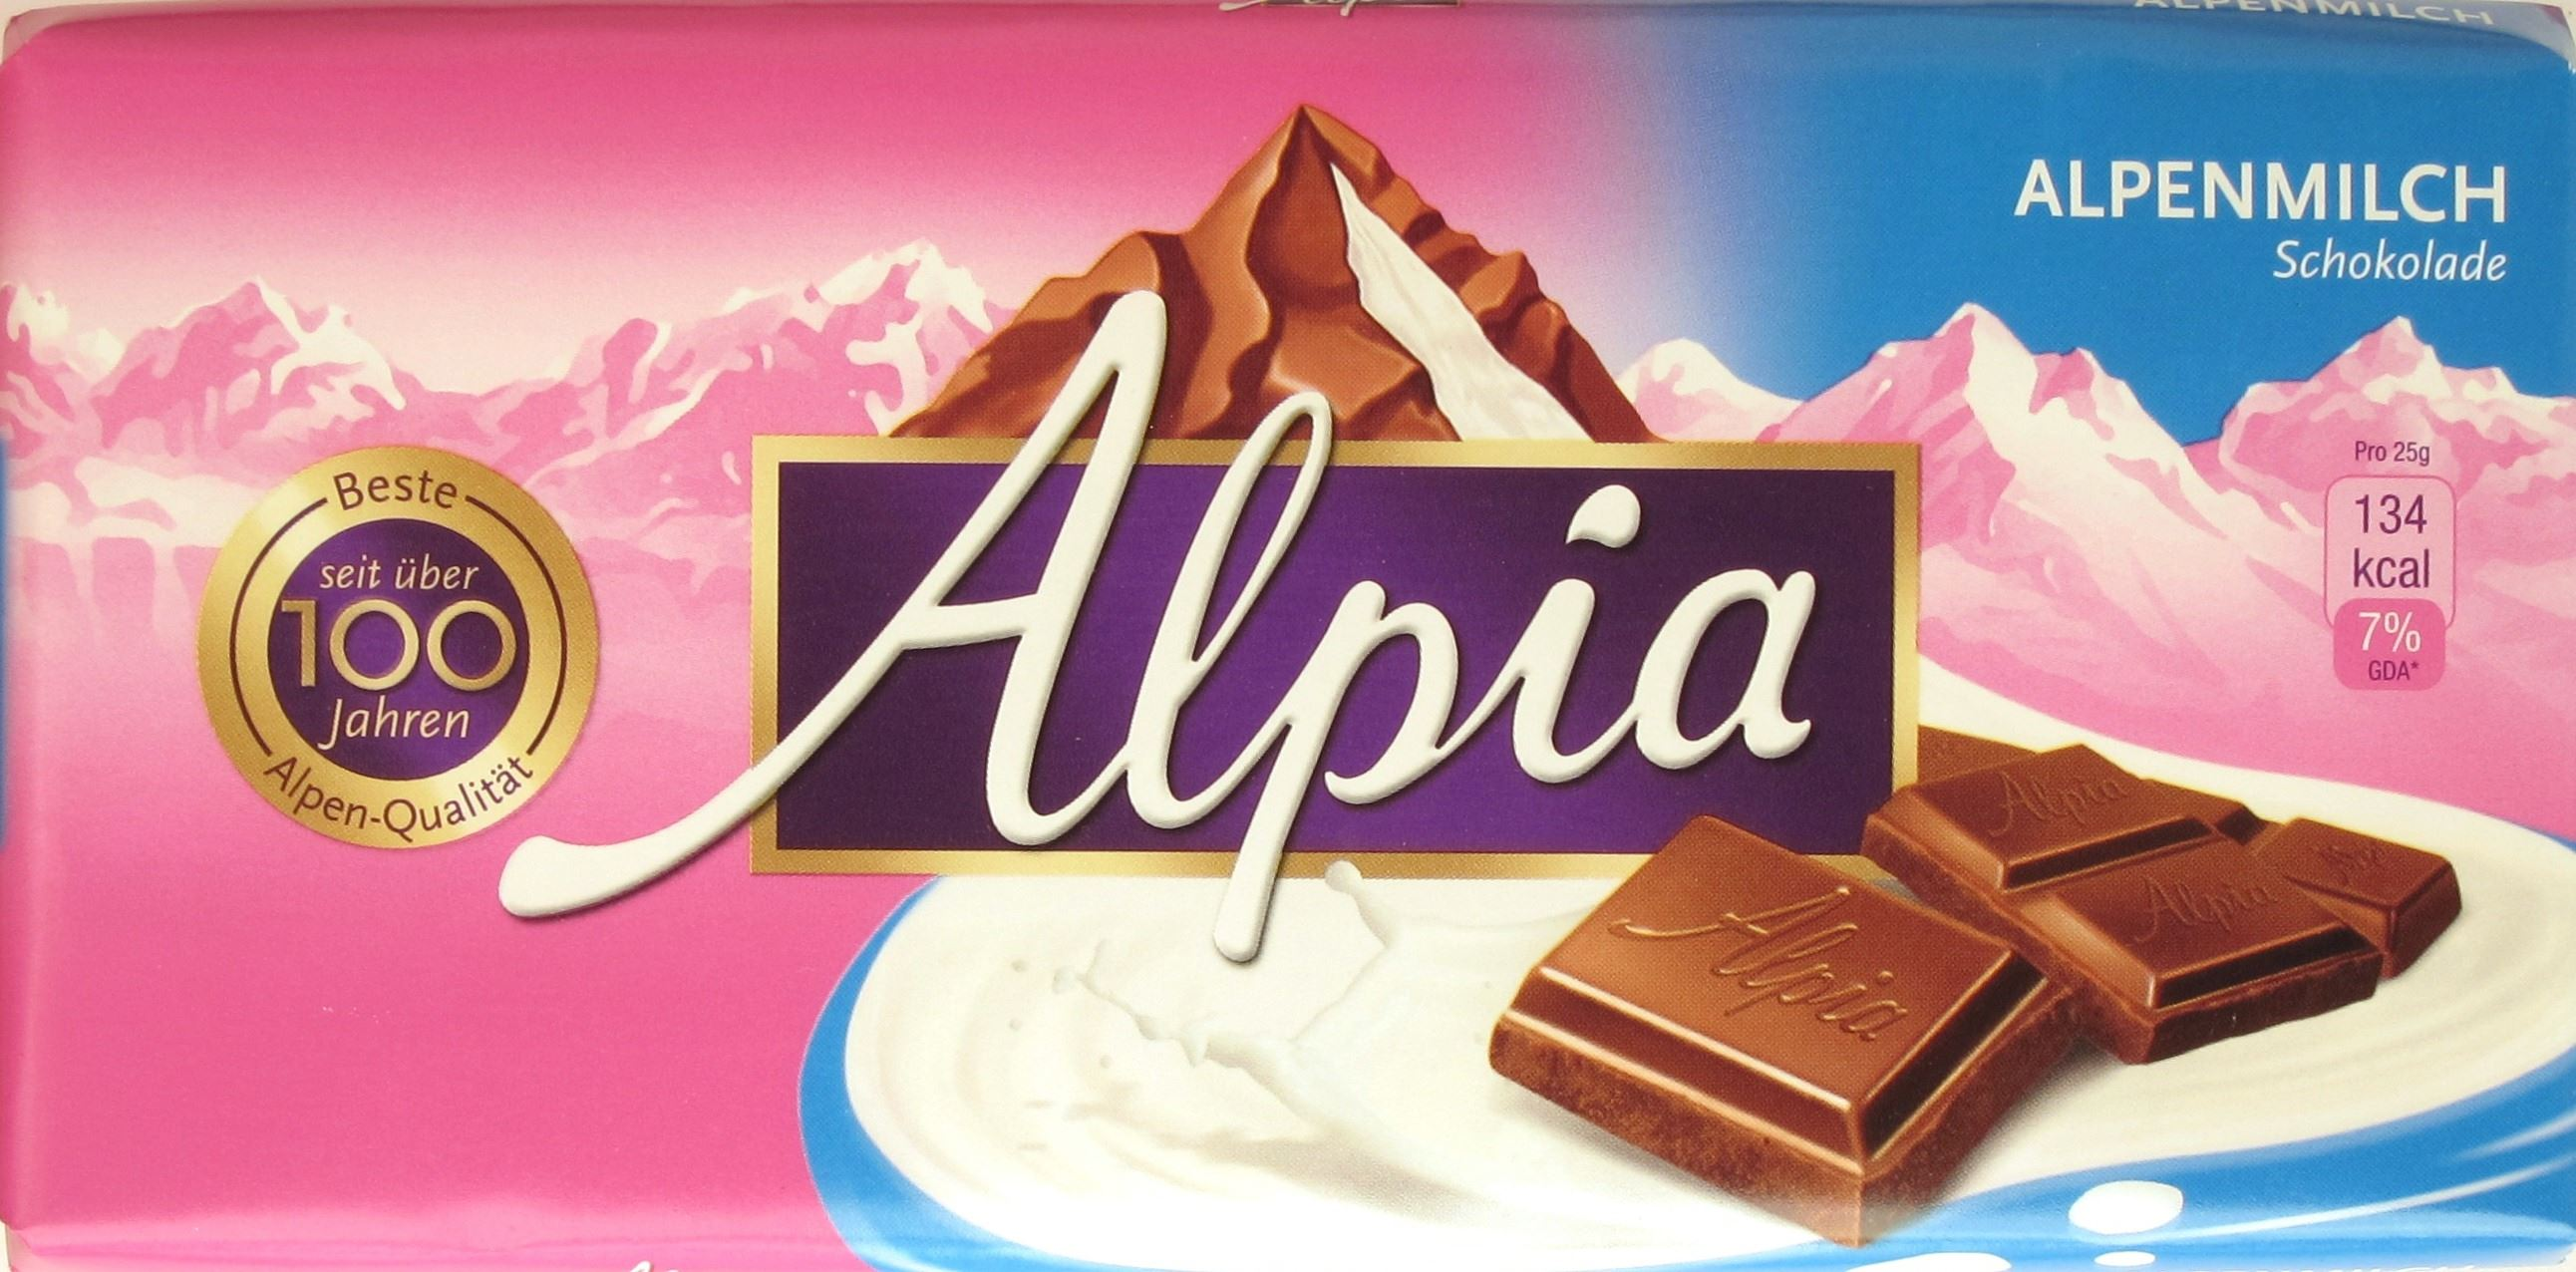 Alpia Alpenmilchschokolade (Stollwerck)